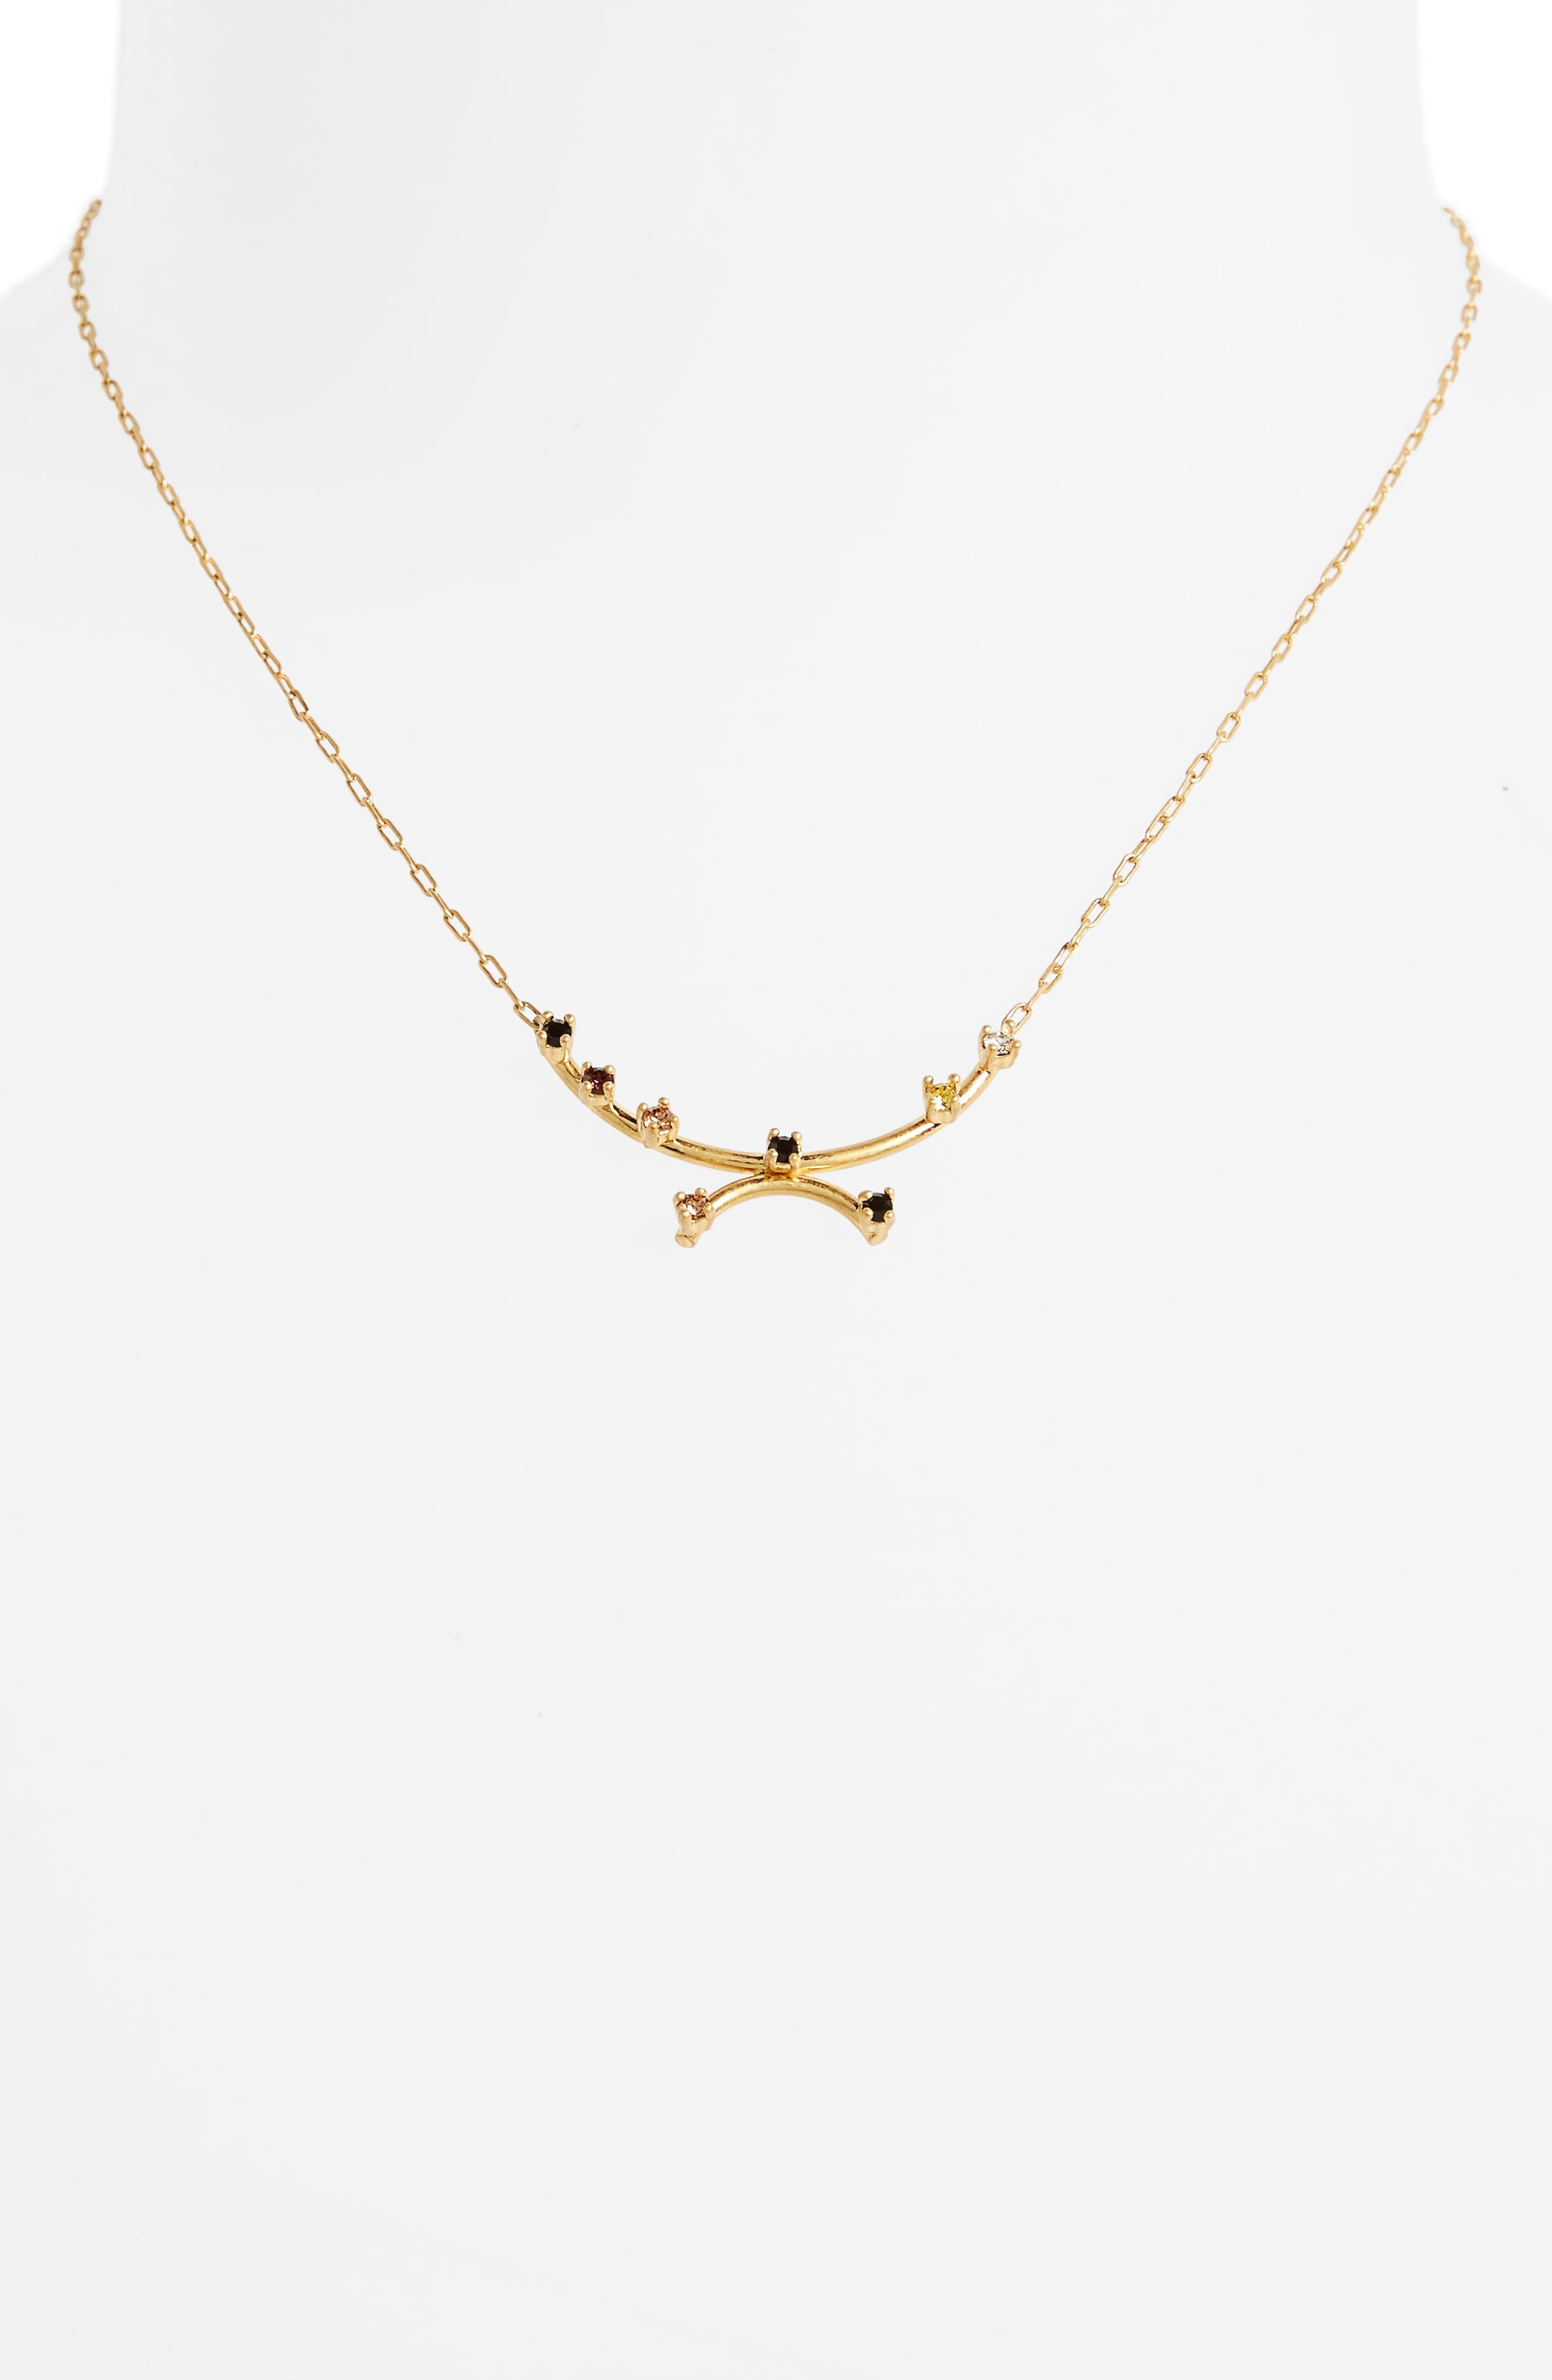 Gem Line Necklace,                             Alternate thumbnail 2, color,                             Vintage Gold